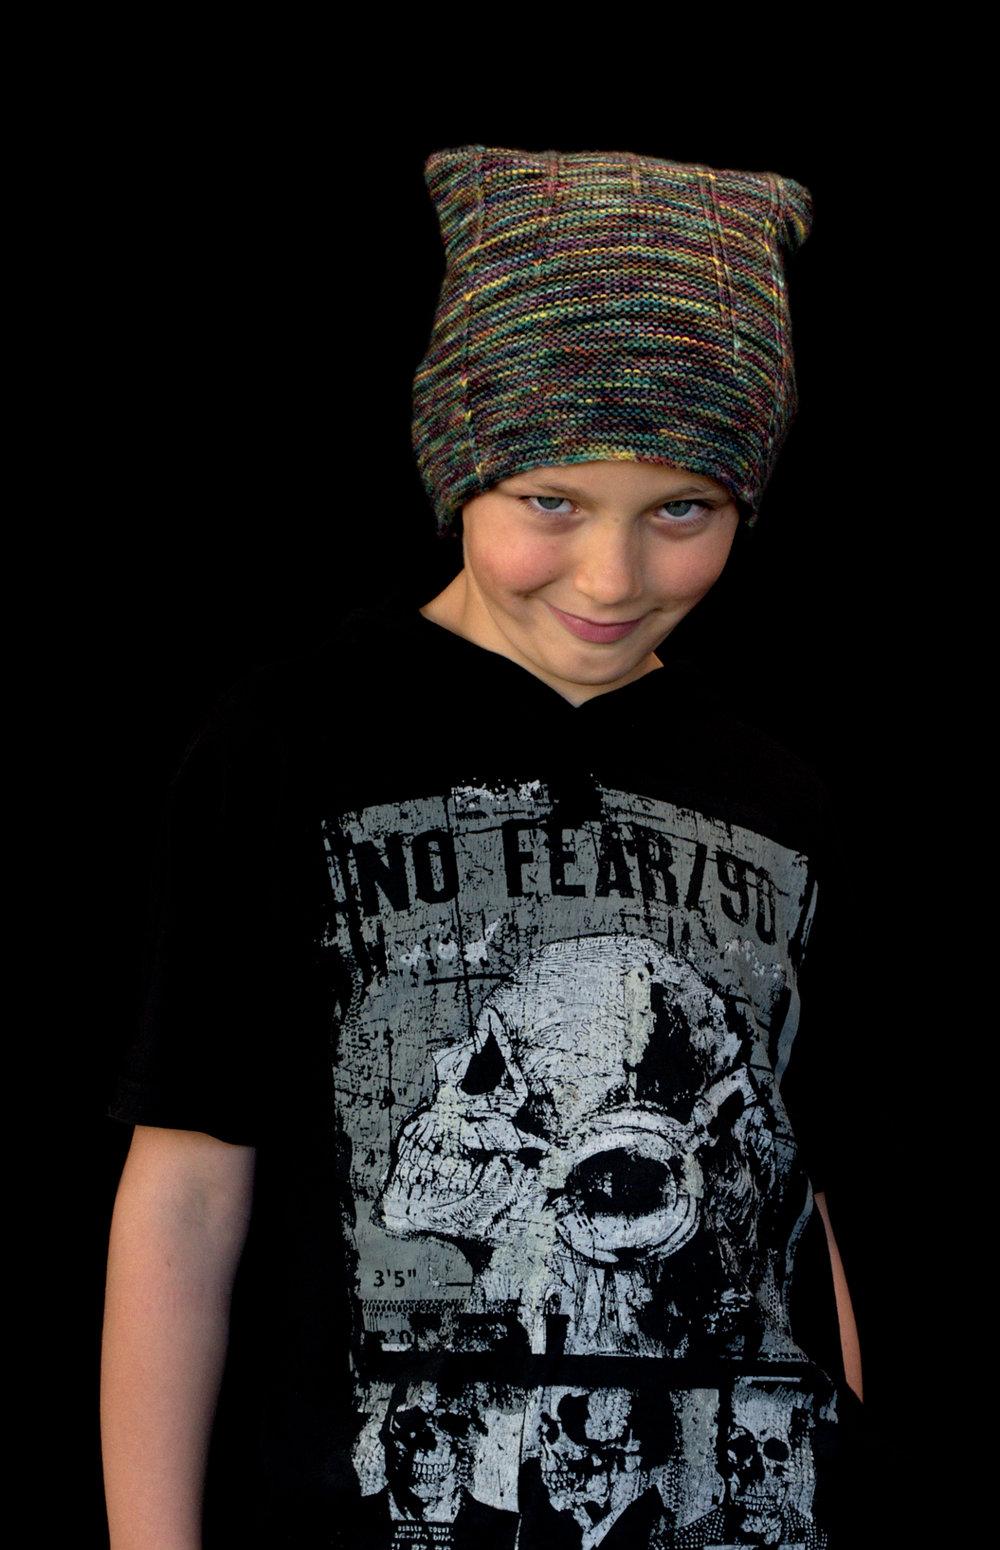 Allerton slouchy skater style Hat hand knitting pattern